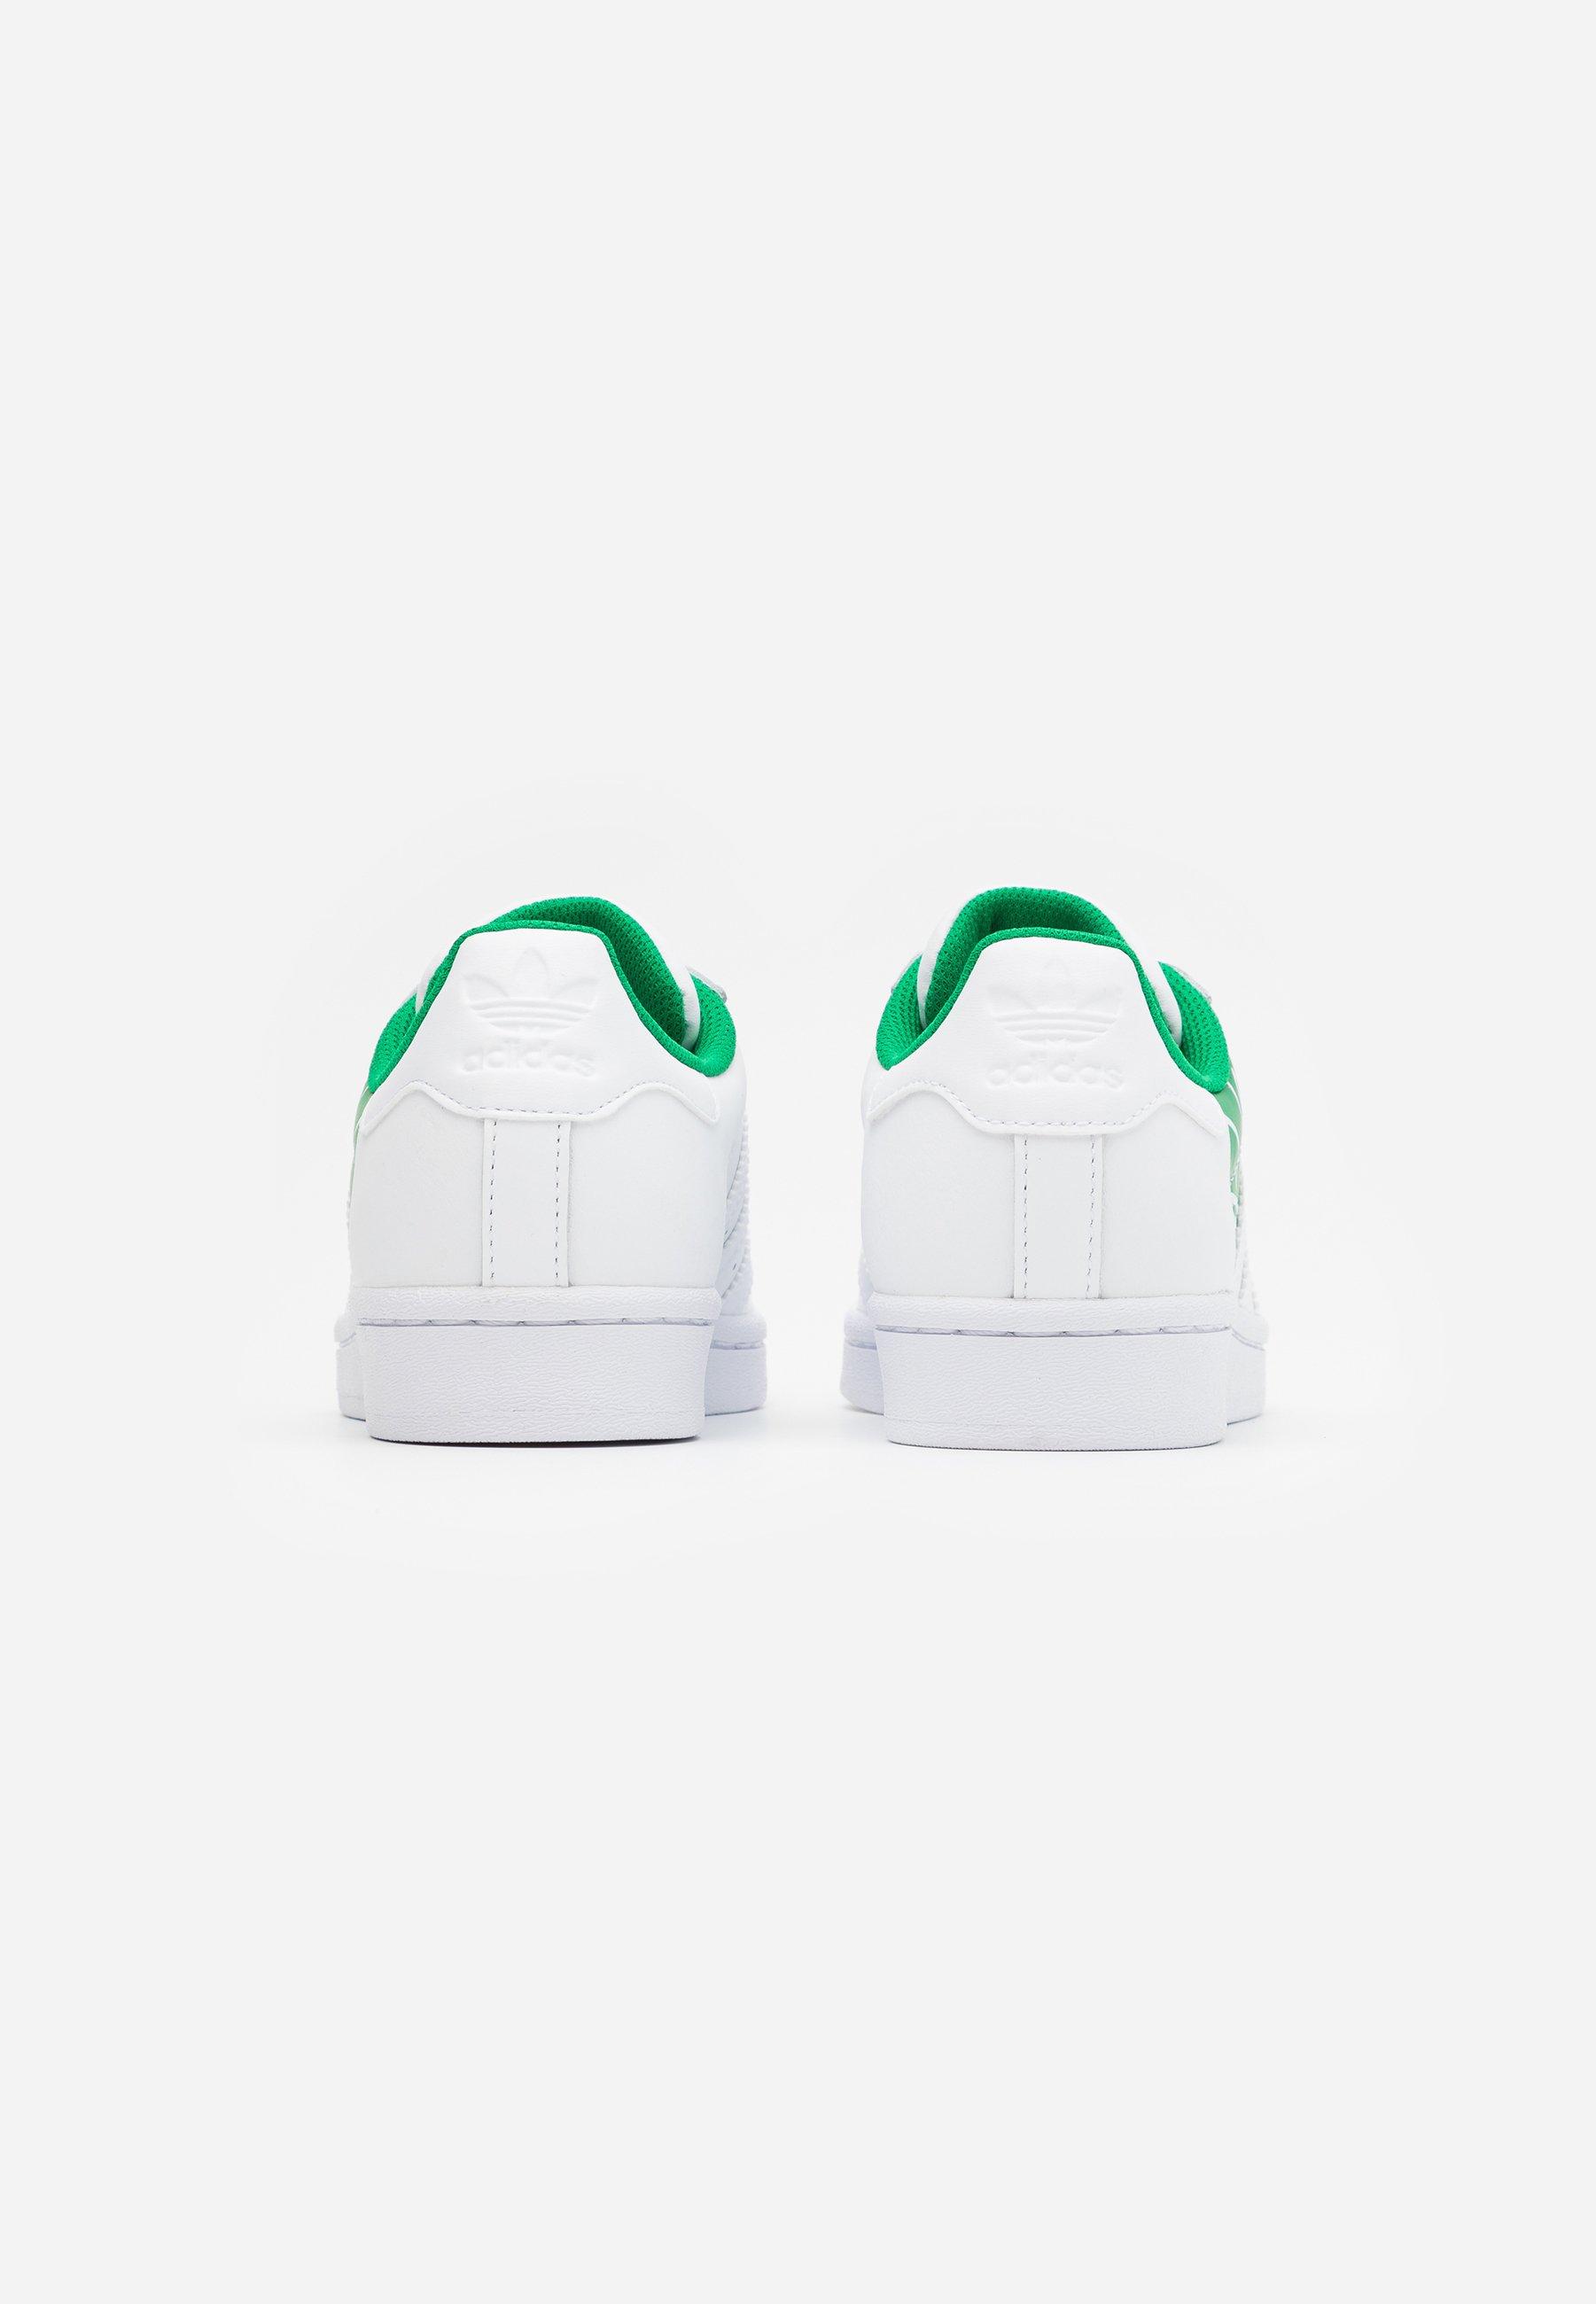 Grande remise Meilleurs prix adidas Originals SUPERSTAR SPORTS INSPIRED SHOES Baskets basses footwear white/green Rb1qh